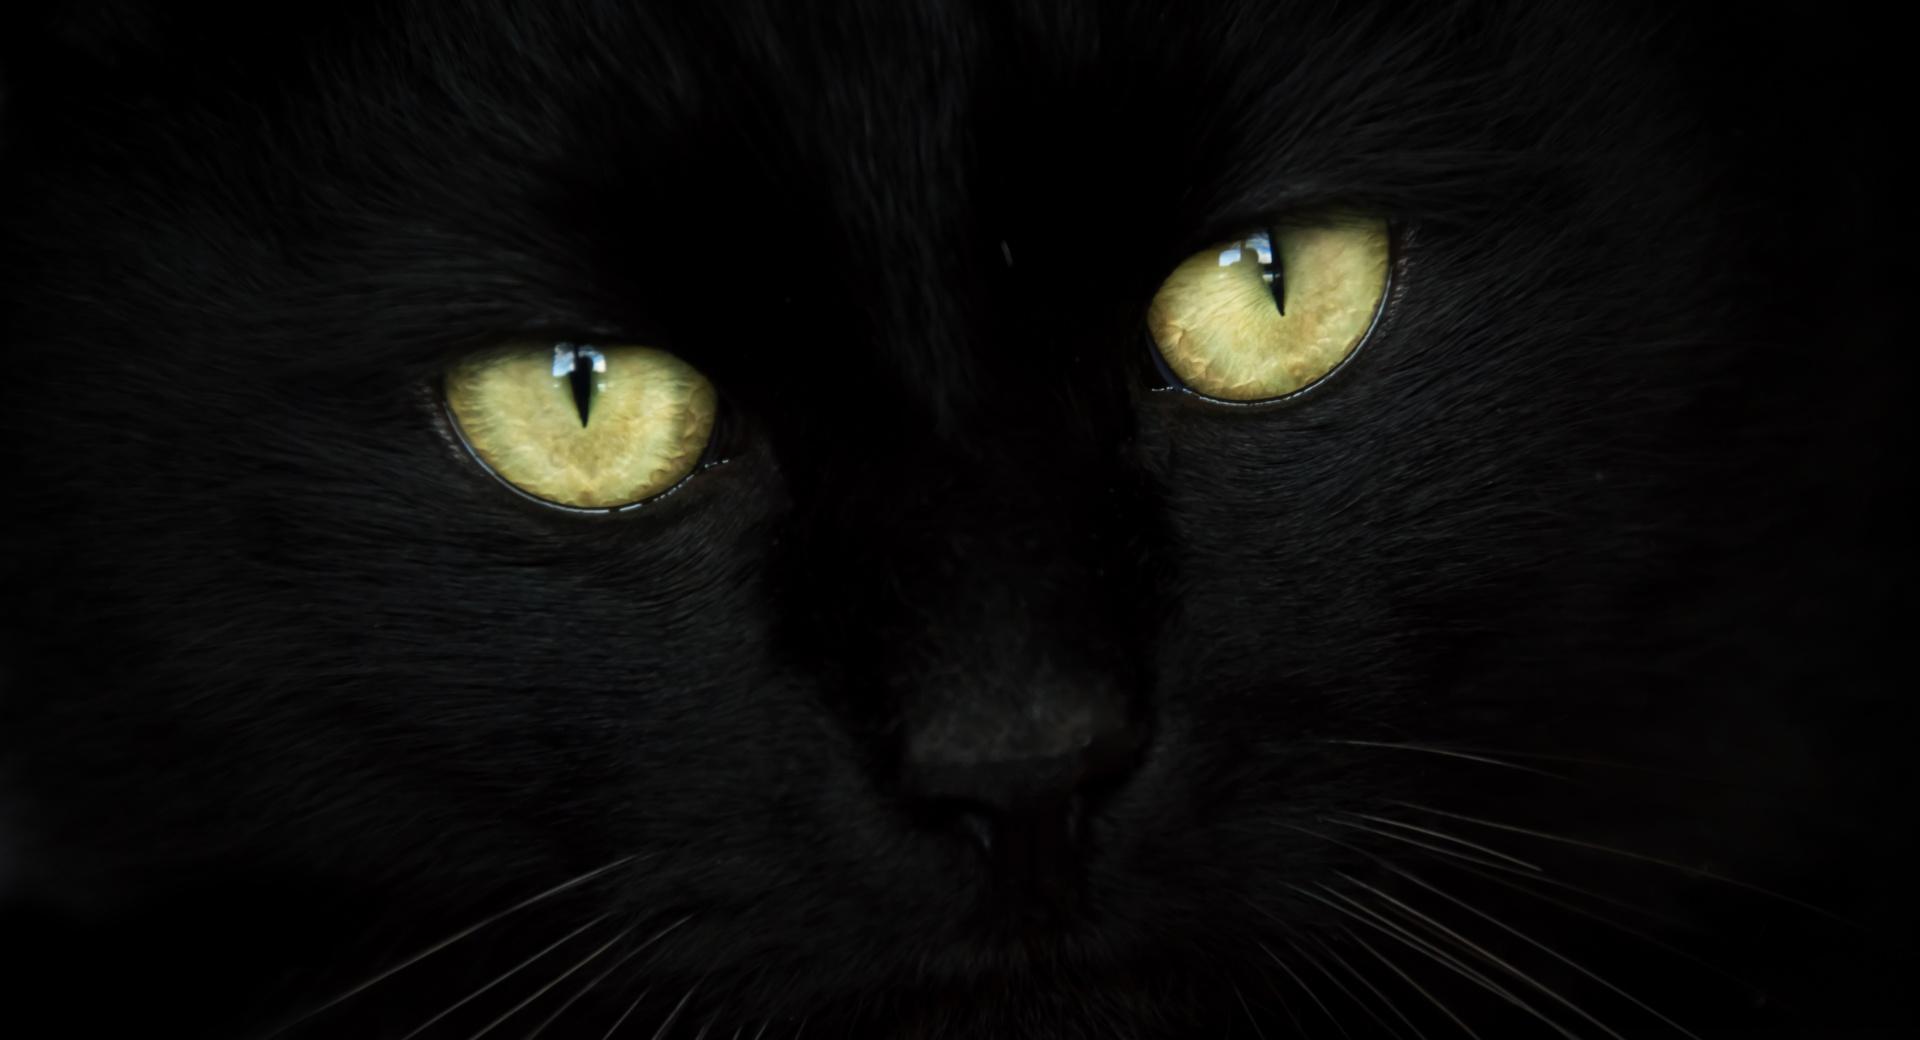 Black Cat Portrait wallpapers HD quality